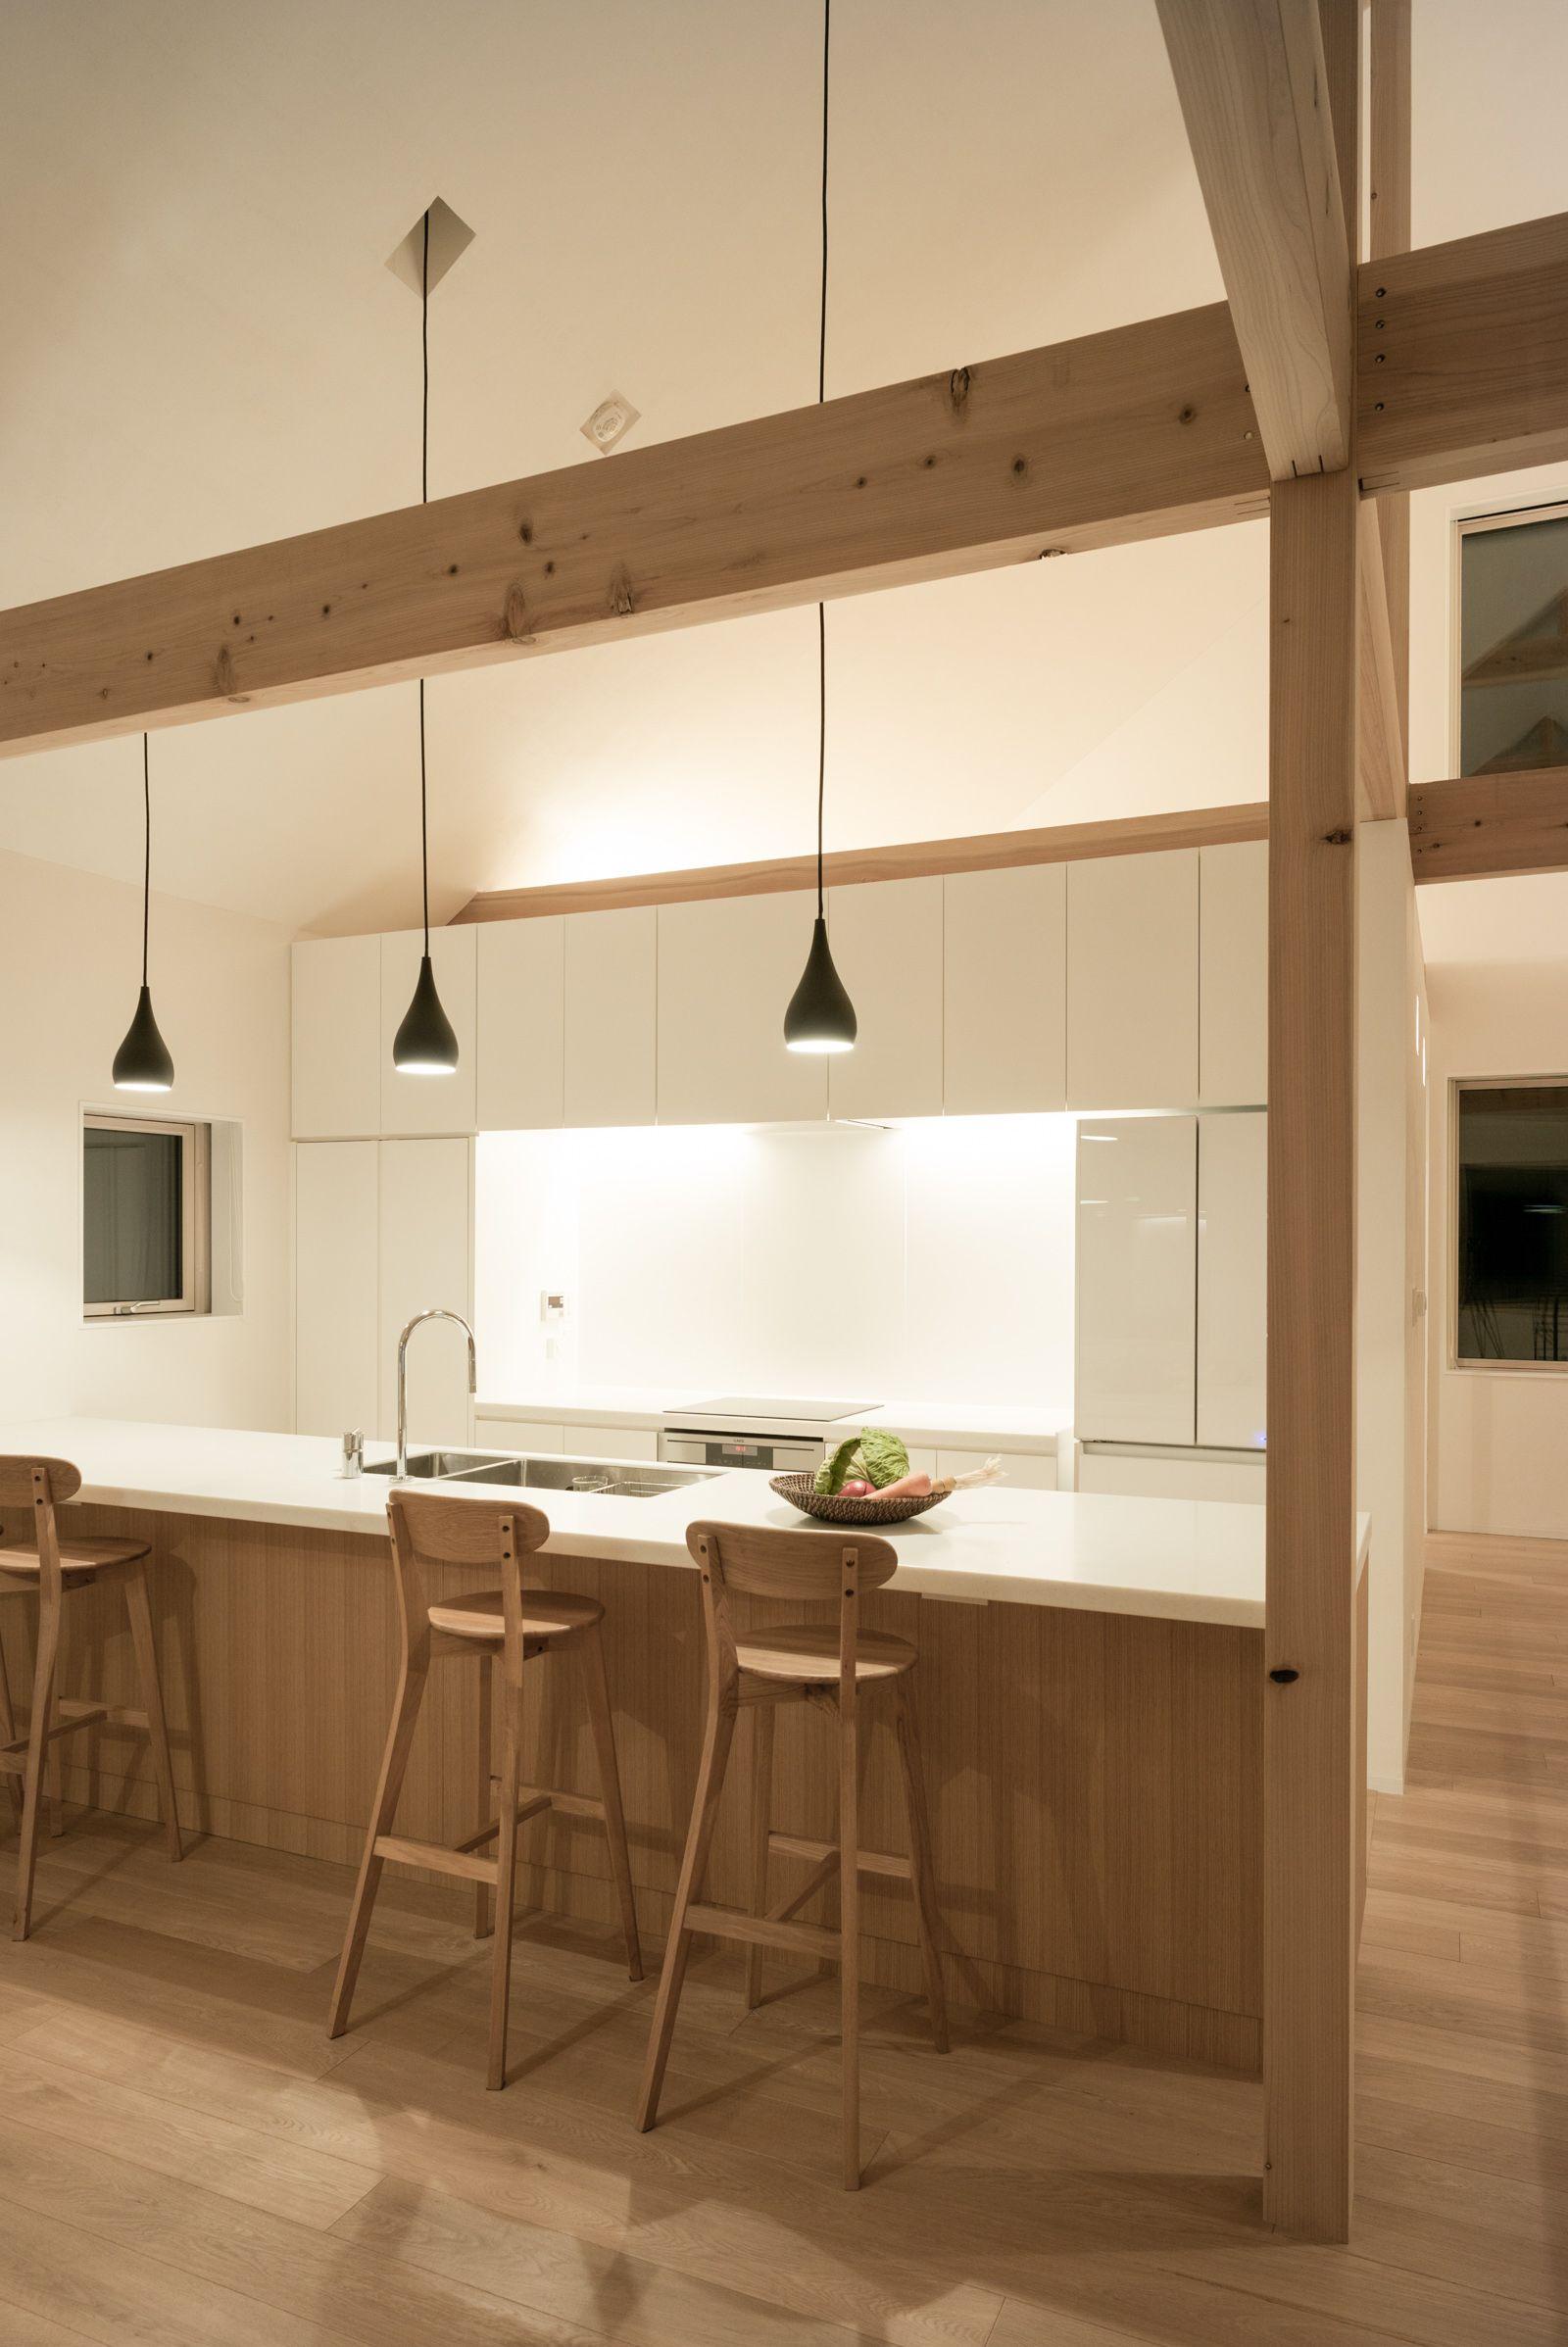 k house in niseko japanese modern house japan interior kitchen interior on kitchen interior japan id=54100